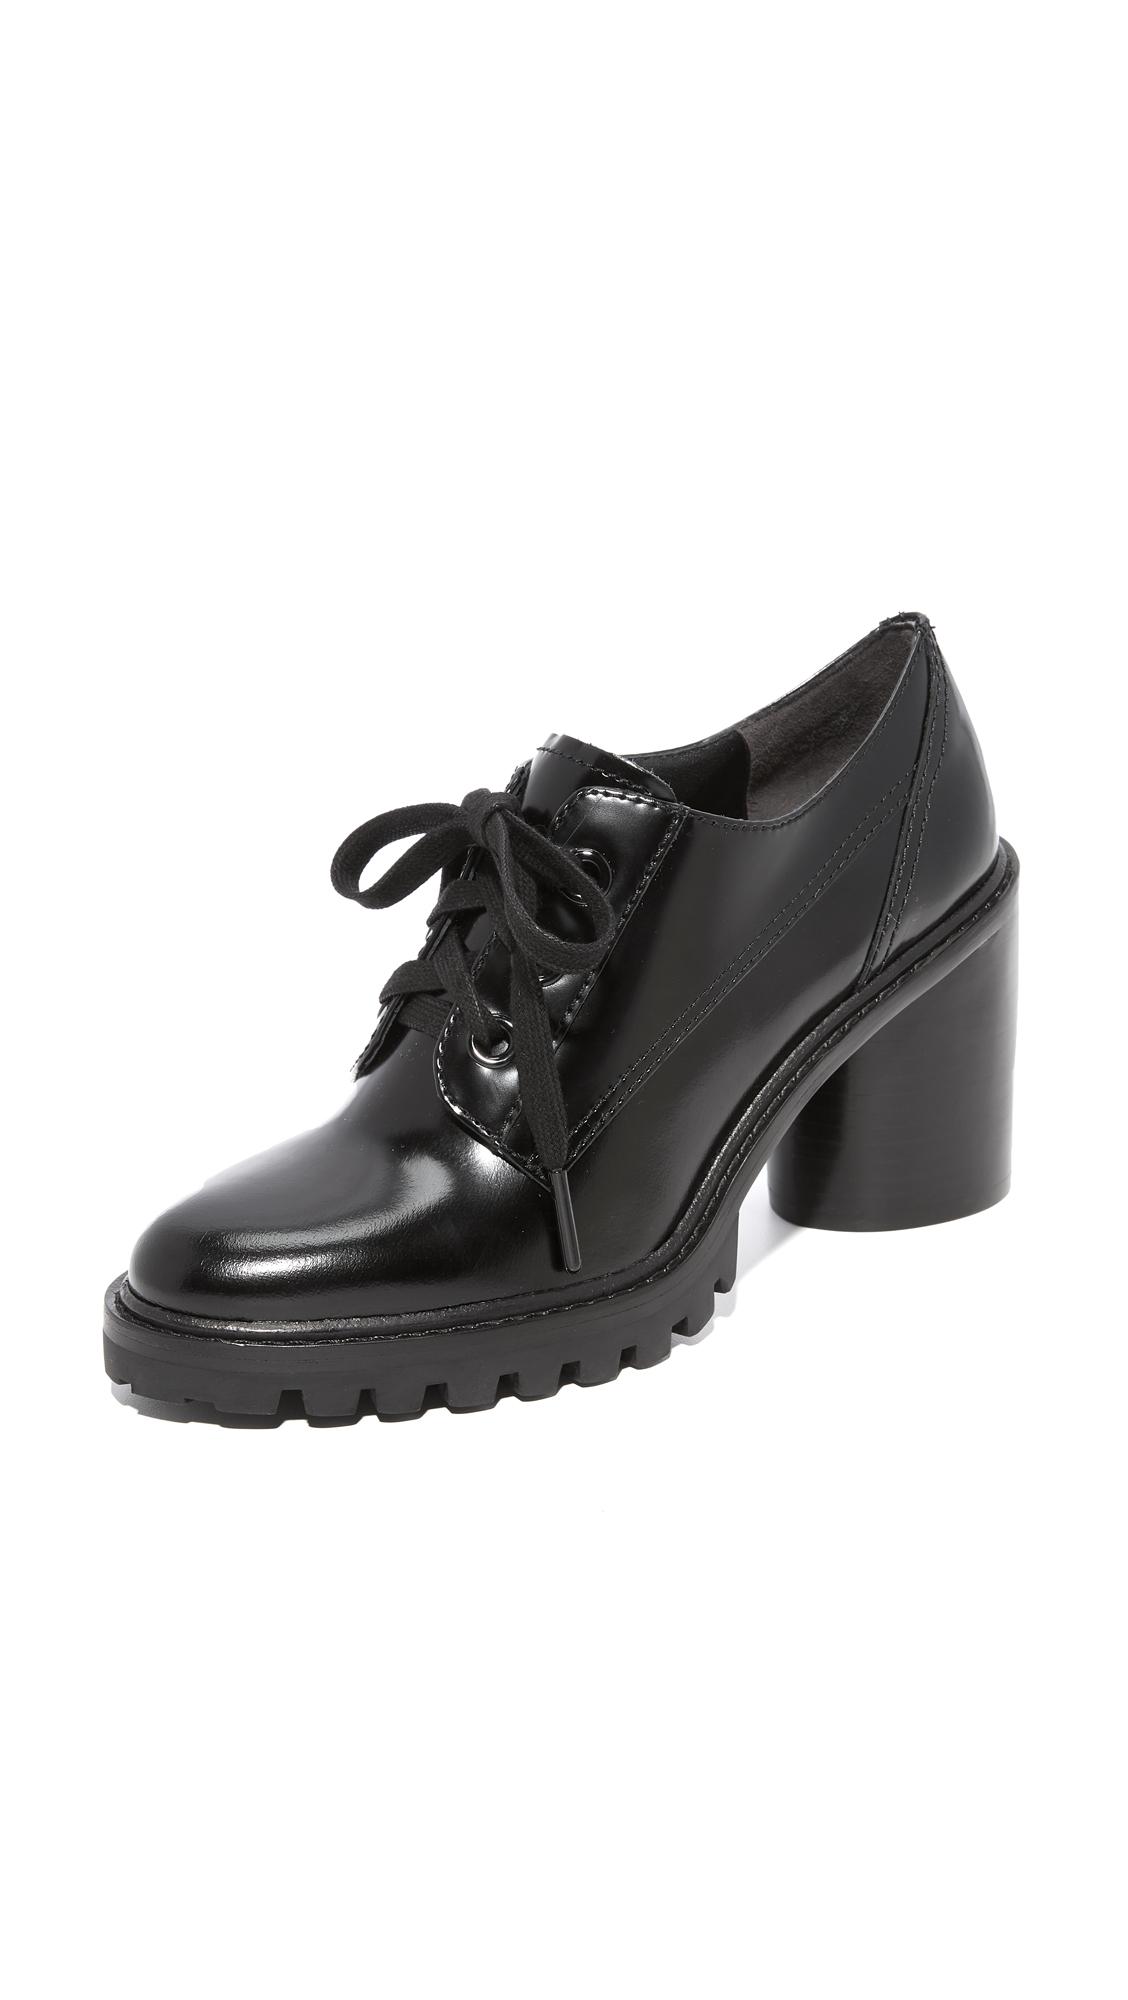 Marc Jacobs Gwen Oxford Pumps - Black